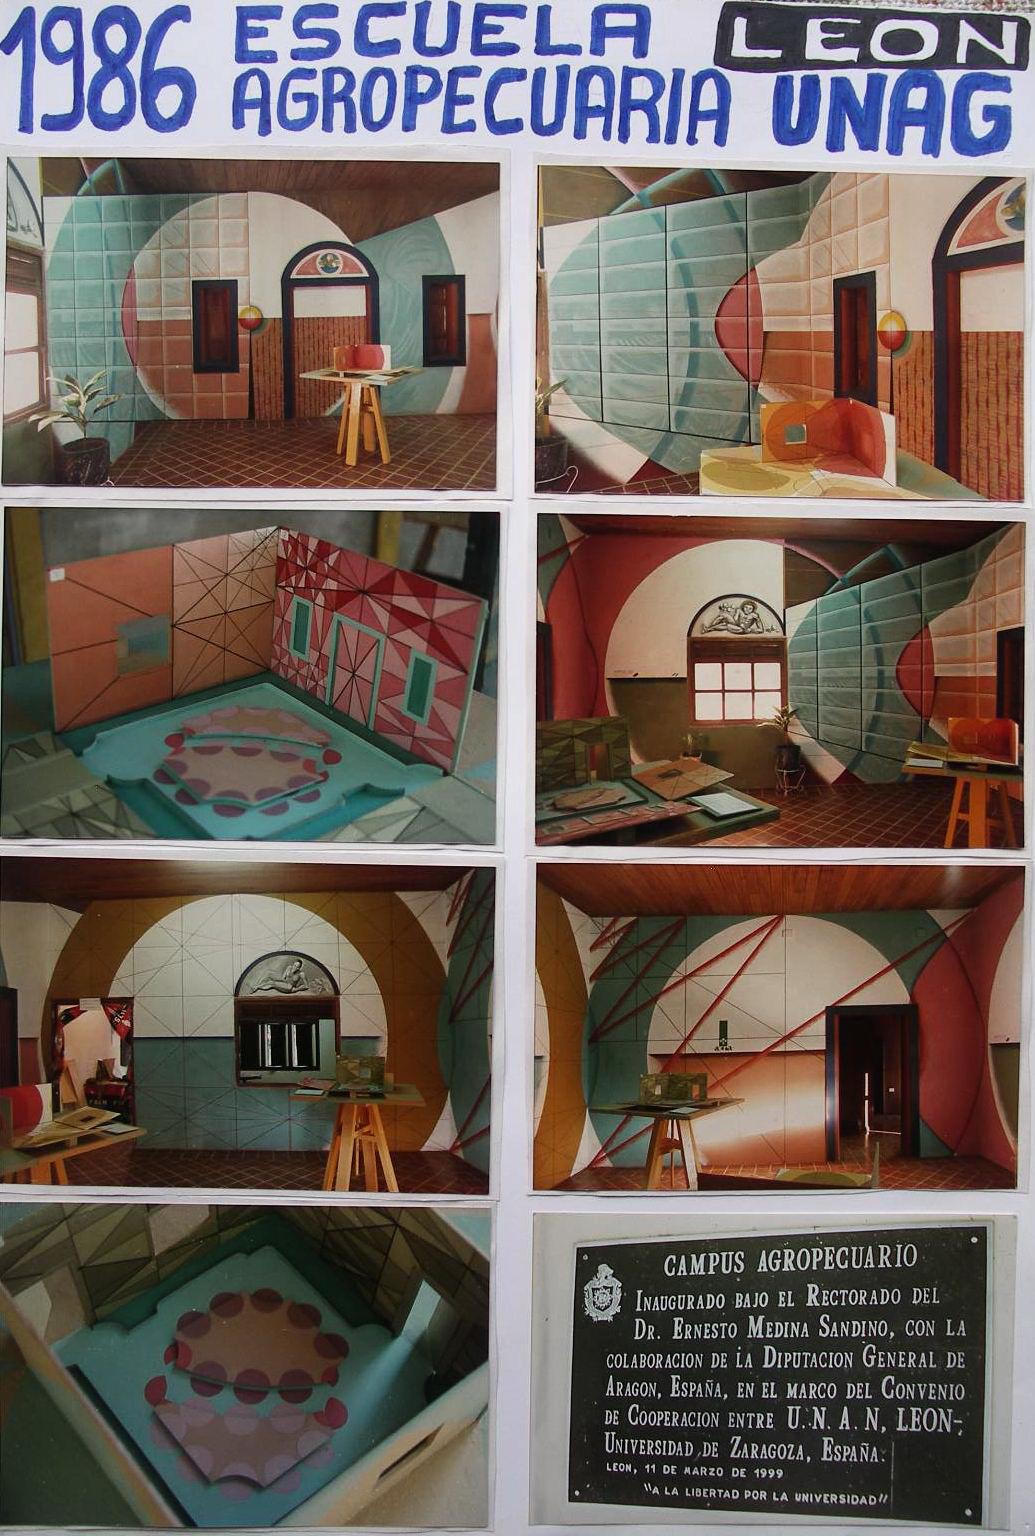 9 - 1986-2   SCUOLA AGROPECUARIA ACRA-UNAG, LEON, NICARAGUA, murale poliangolare didattico.